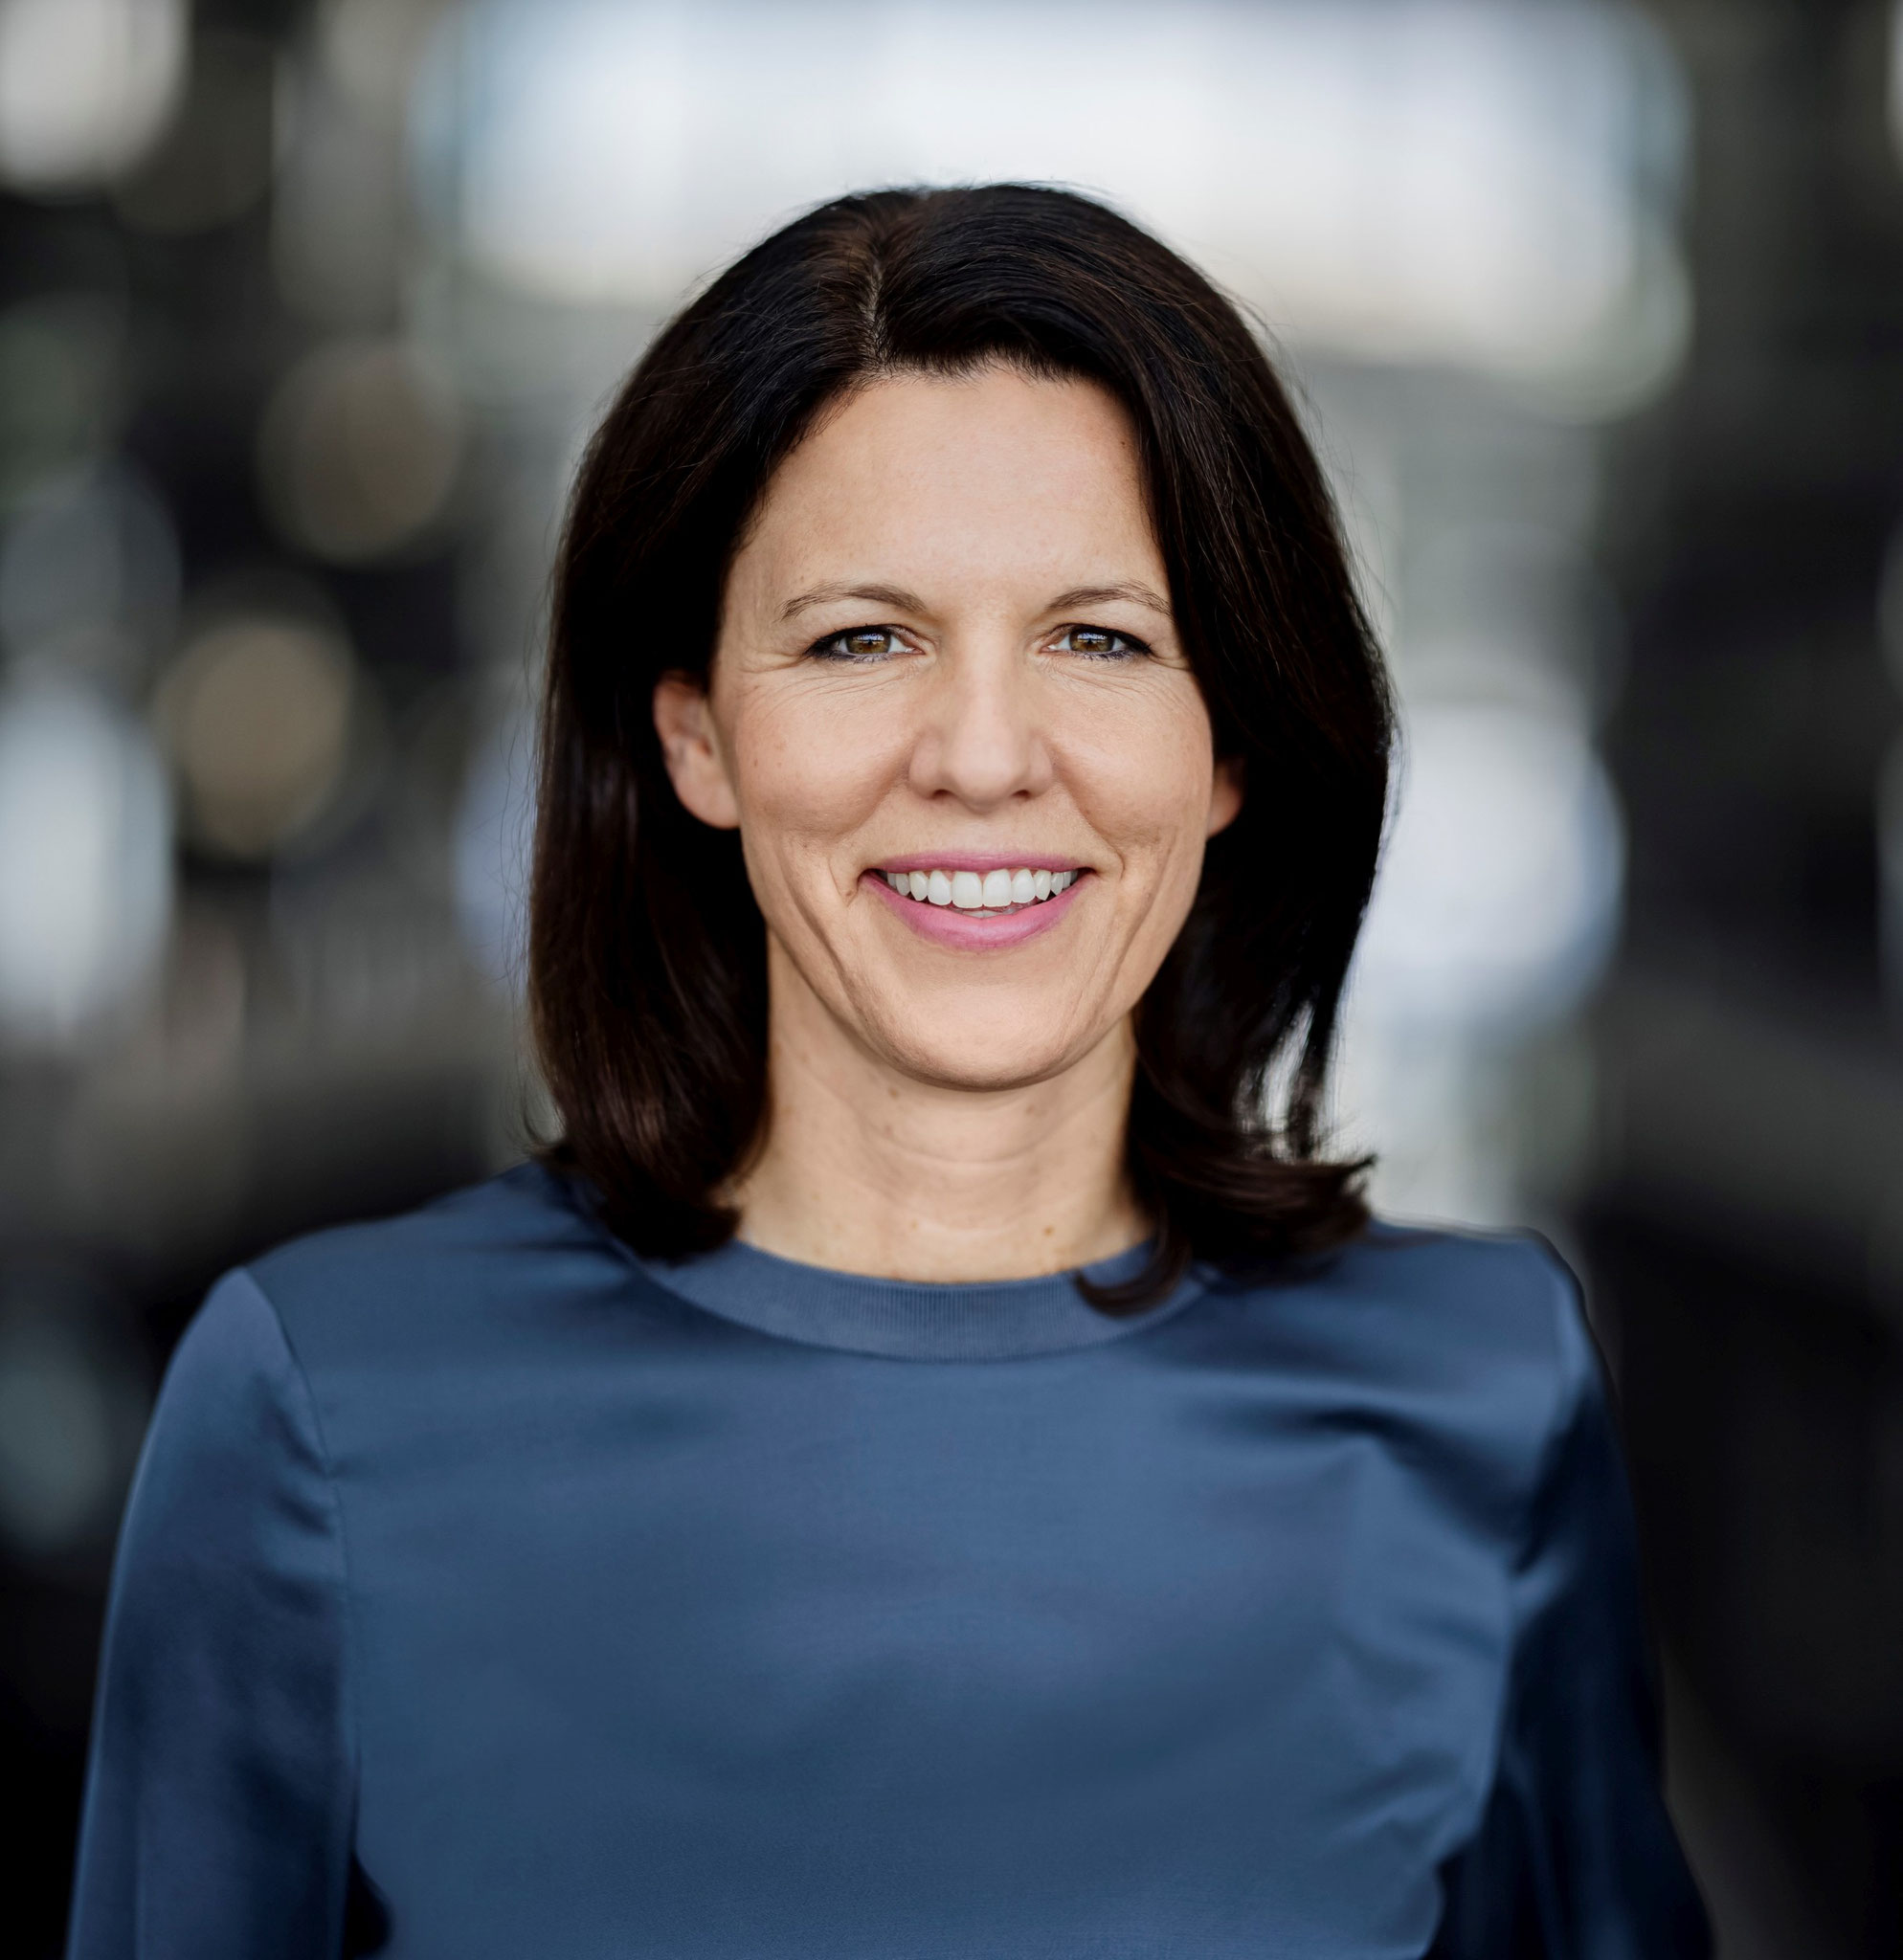 "Dr. Katja Leikert (MdB) Kandidatin der CDU, zu Gast am 15.09.2021 ""Landwirtschaft & Ernährung"""